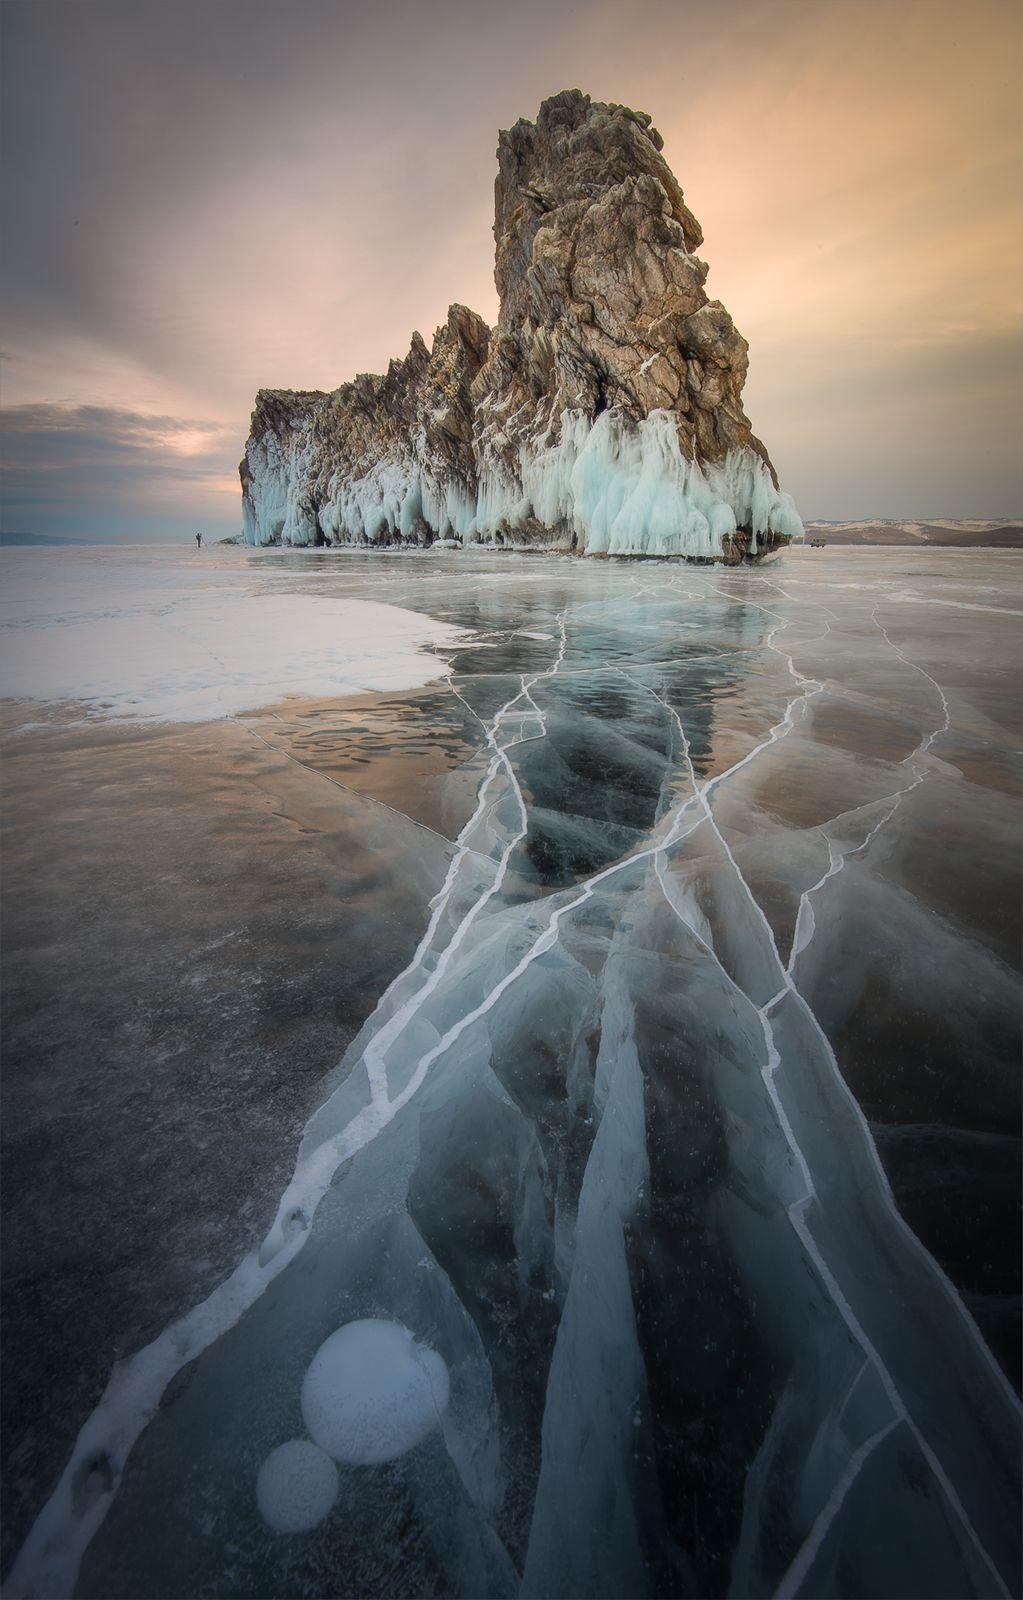 Natgeoyourshot National Geographic Photography The Rock Photos Nature Photography